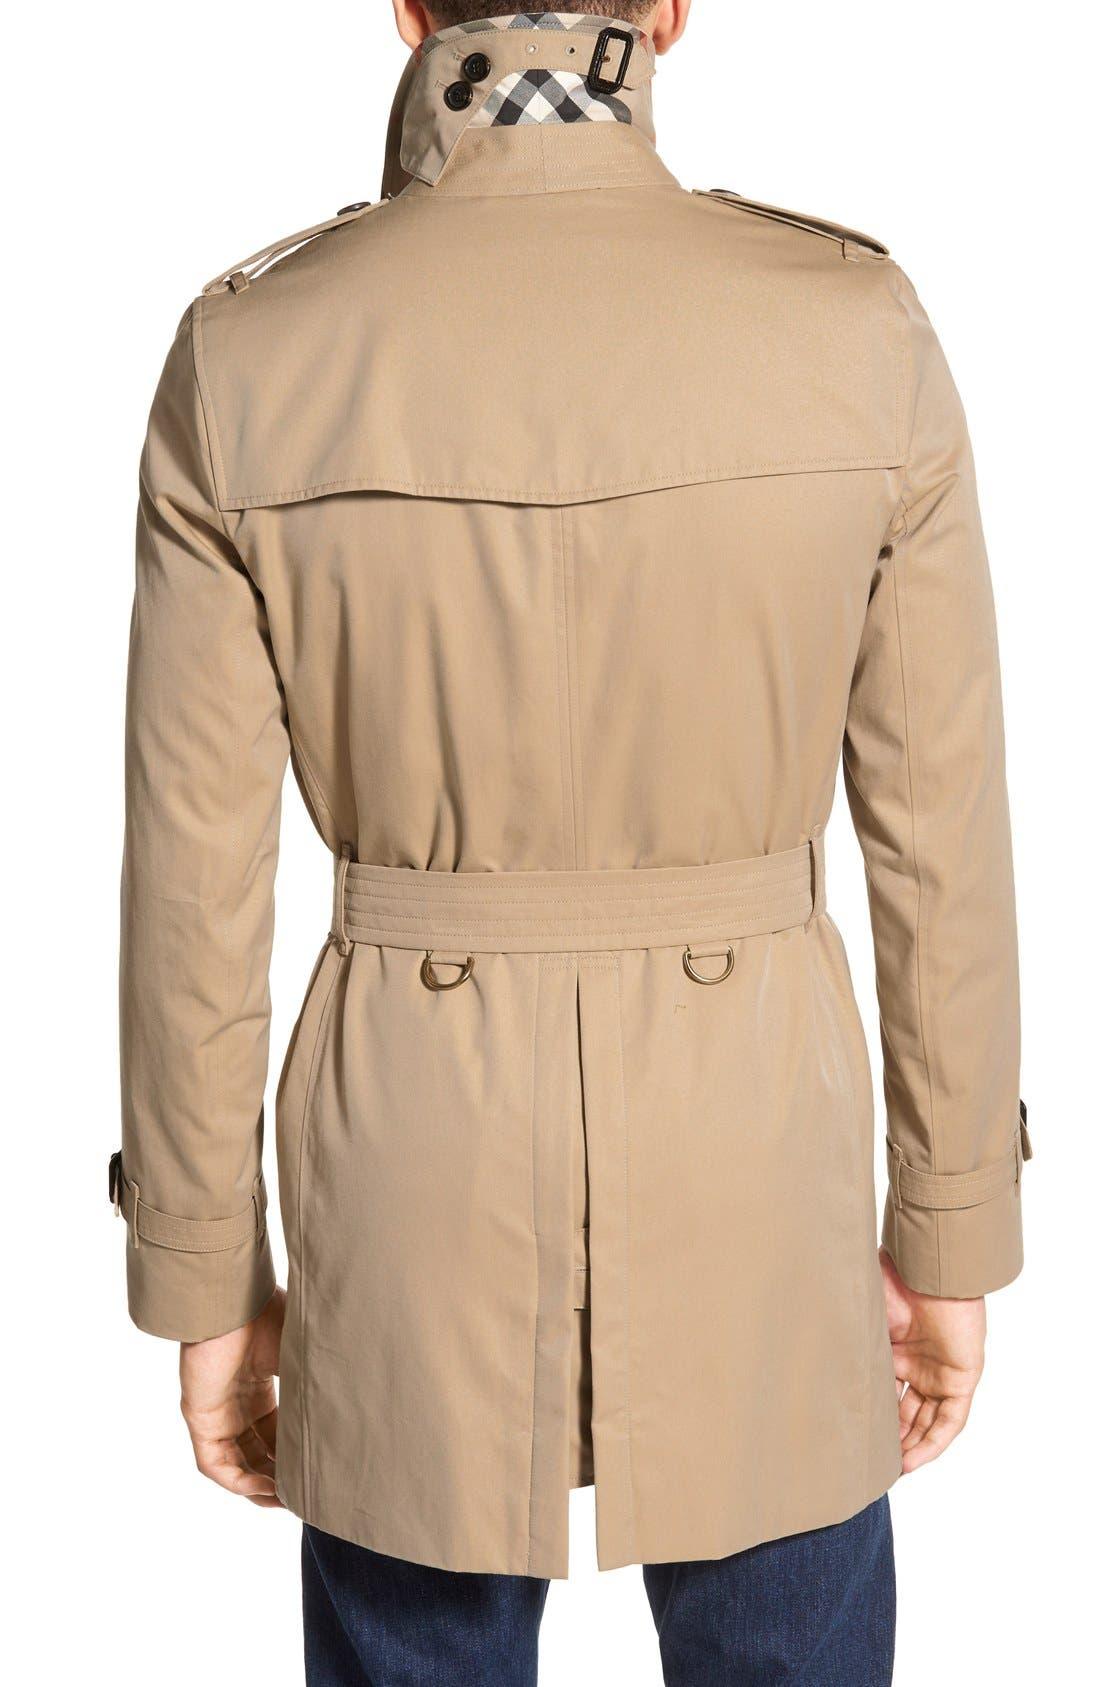 Kensington Double Breasted Trench Coat,                             Alternate thumbnail 2, color,                             HONEY